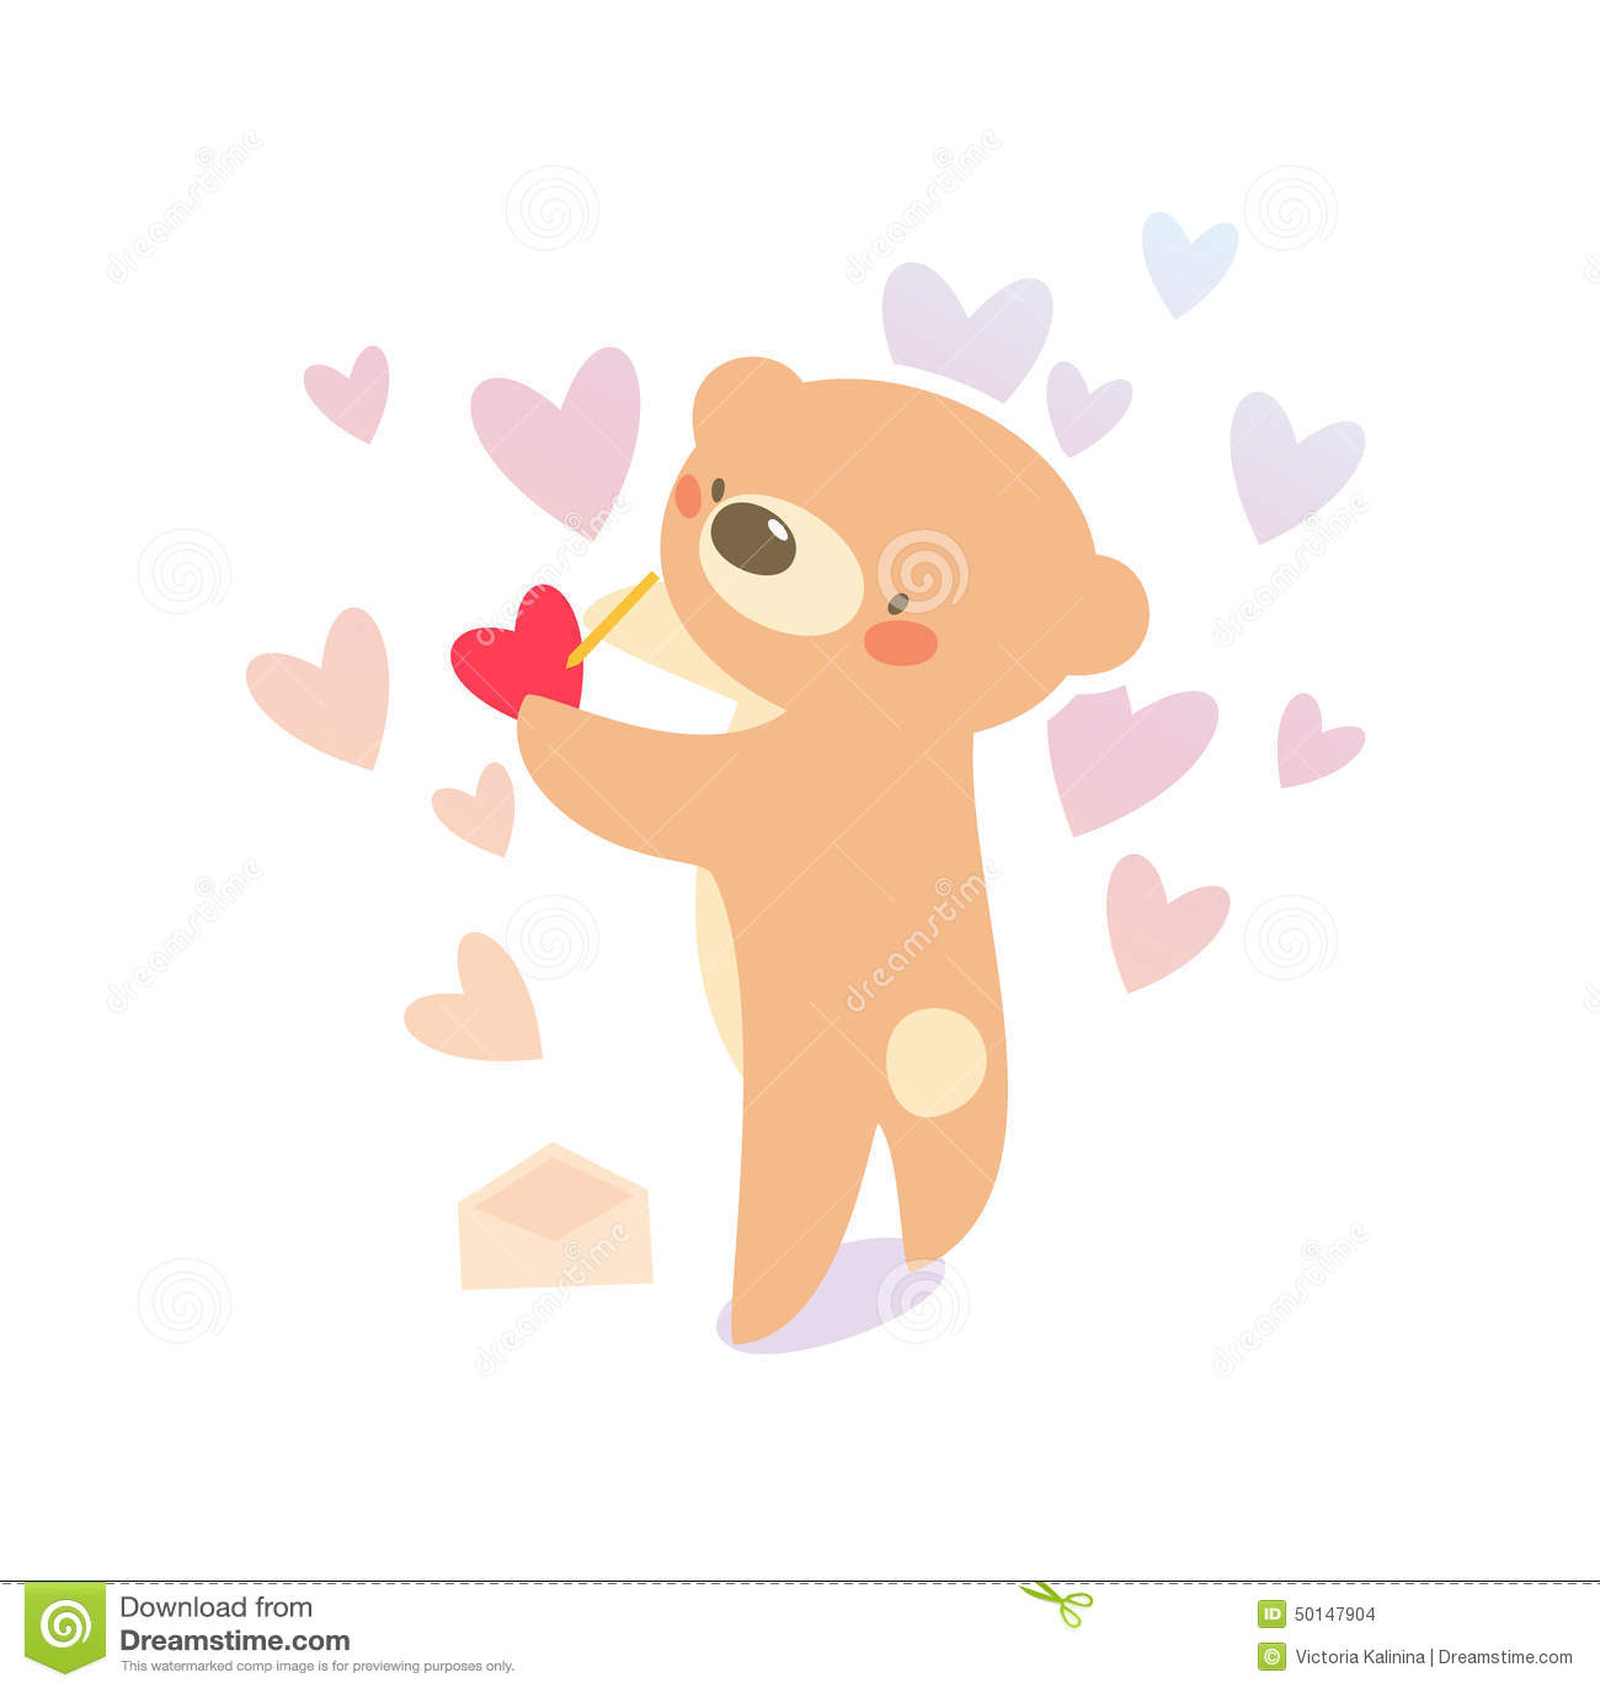 essay on bear in english Contextual translation of hen essay into hindi human translations with examples: hen, मुर्गी, निबन्ध, sabji wala, गिनी मुर्गी, मुर्गी पक्षी, मुर्गी निबंध.